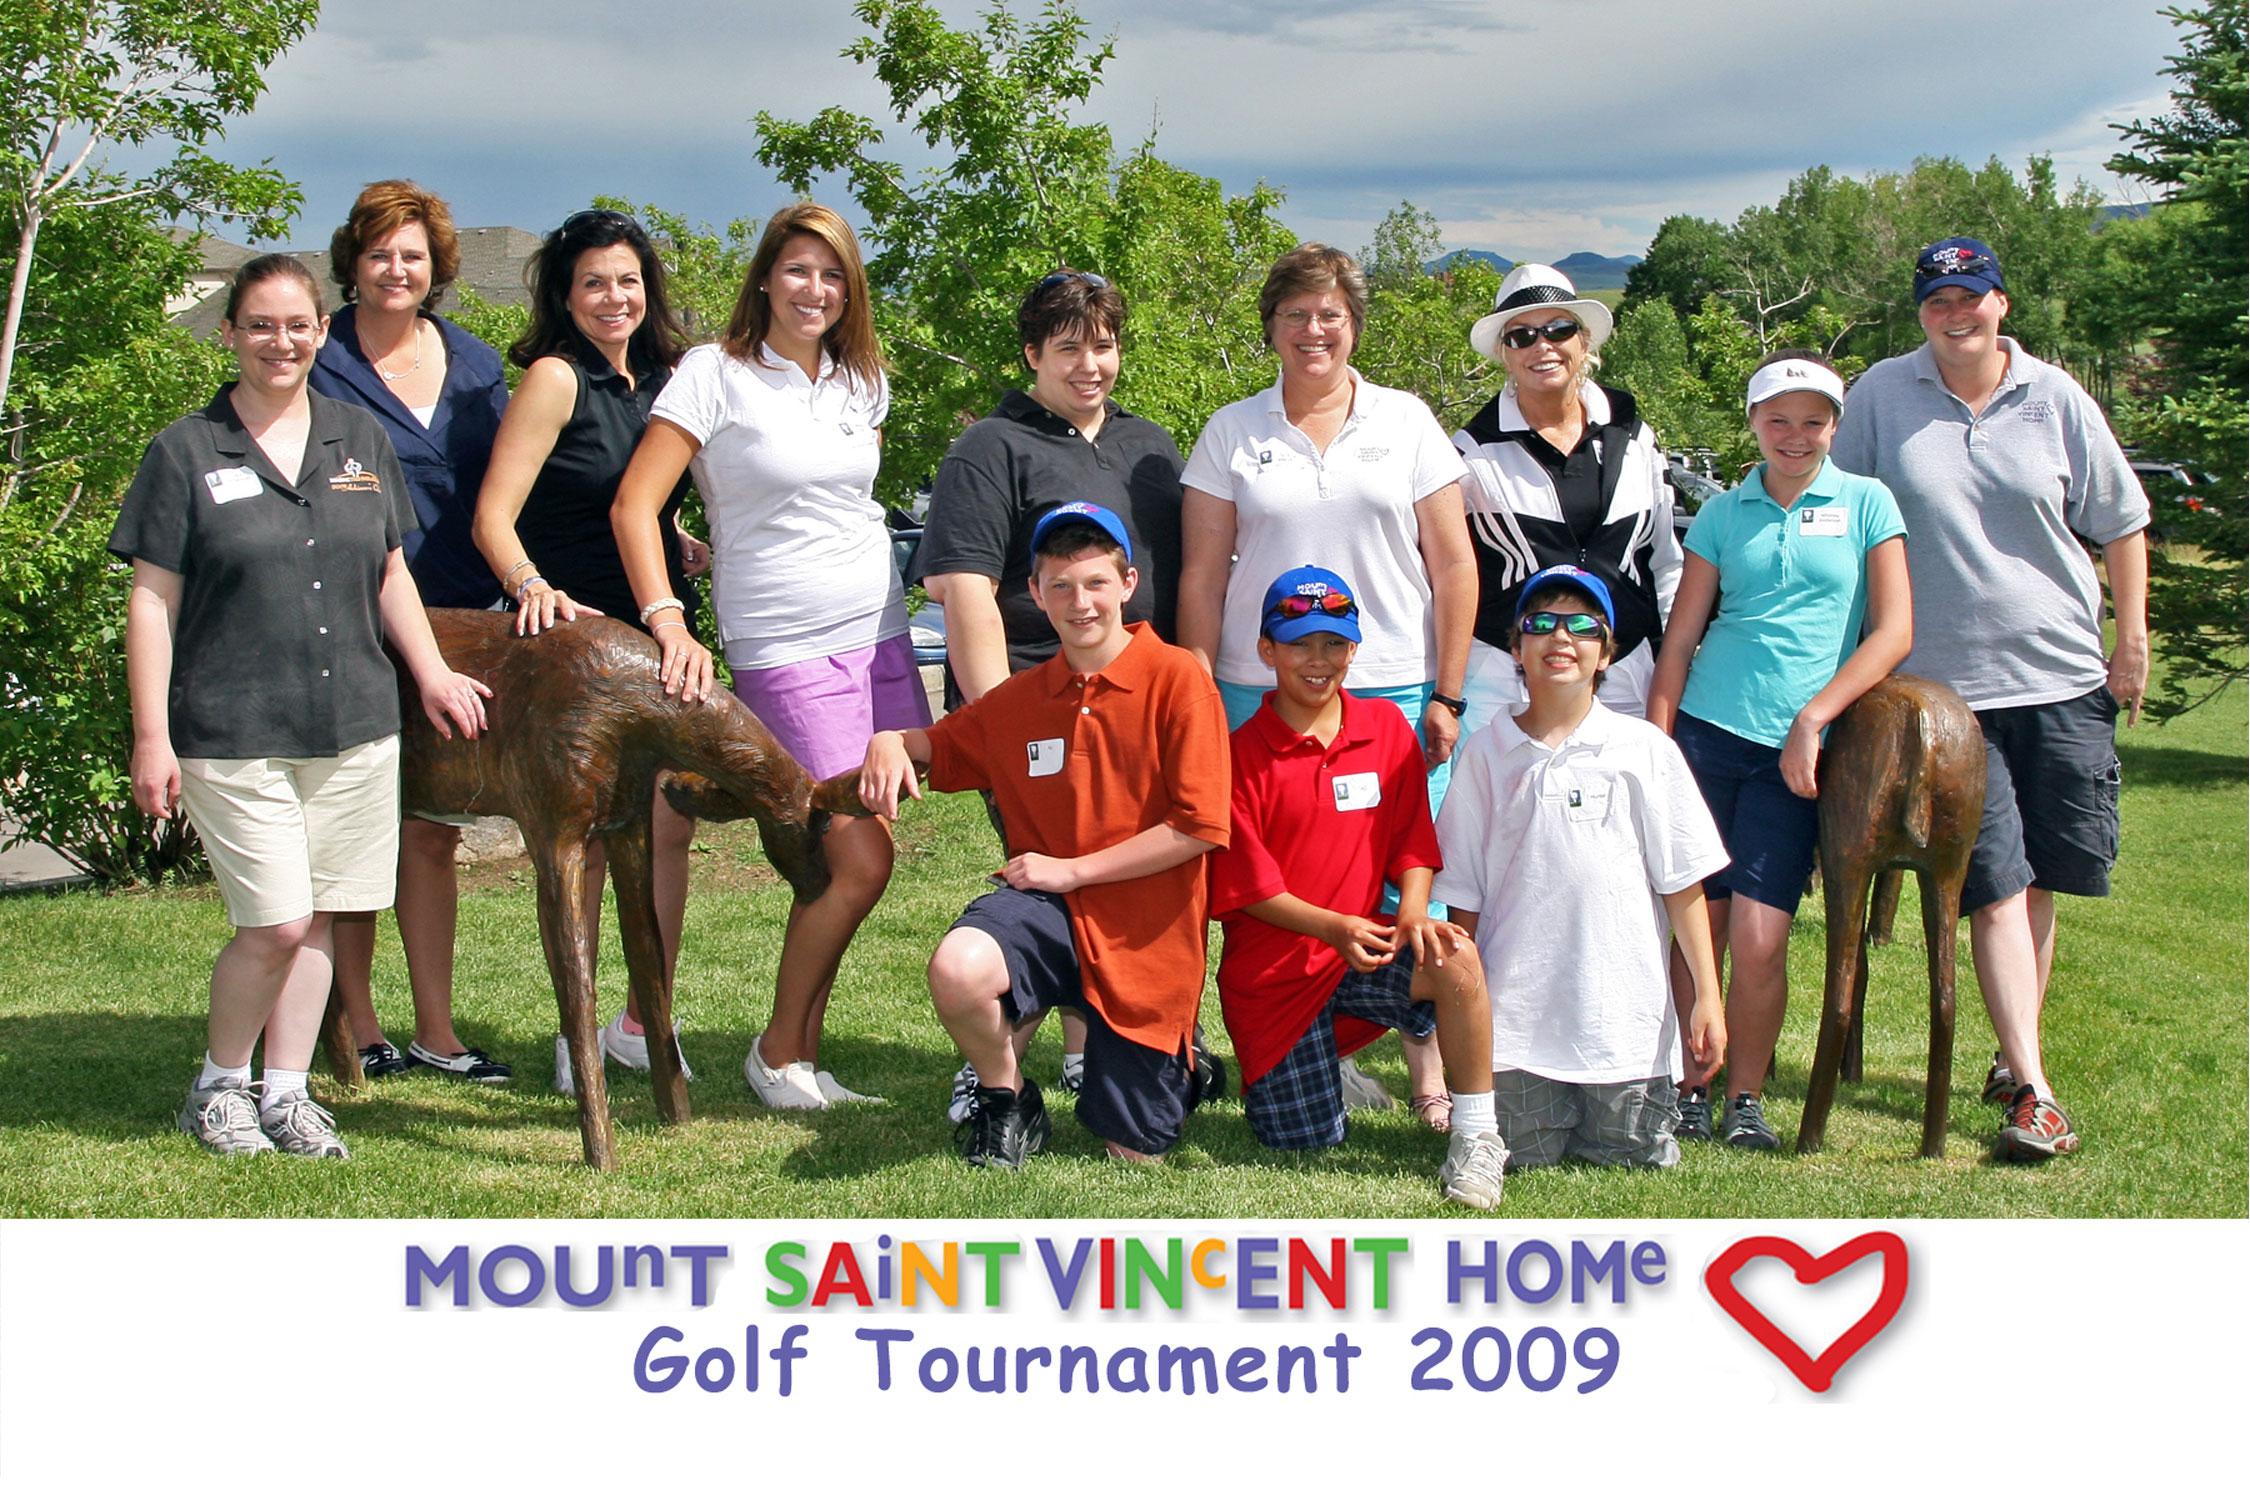 Mt-St-Vin-2009-5x7-edit-copy-copy.jpg